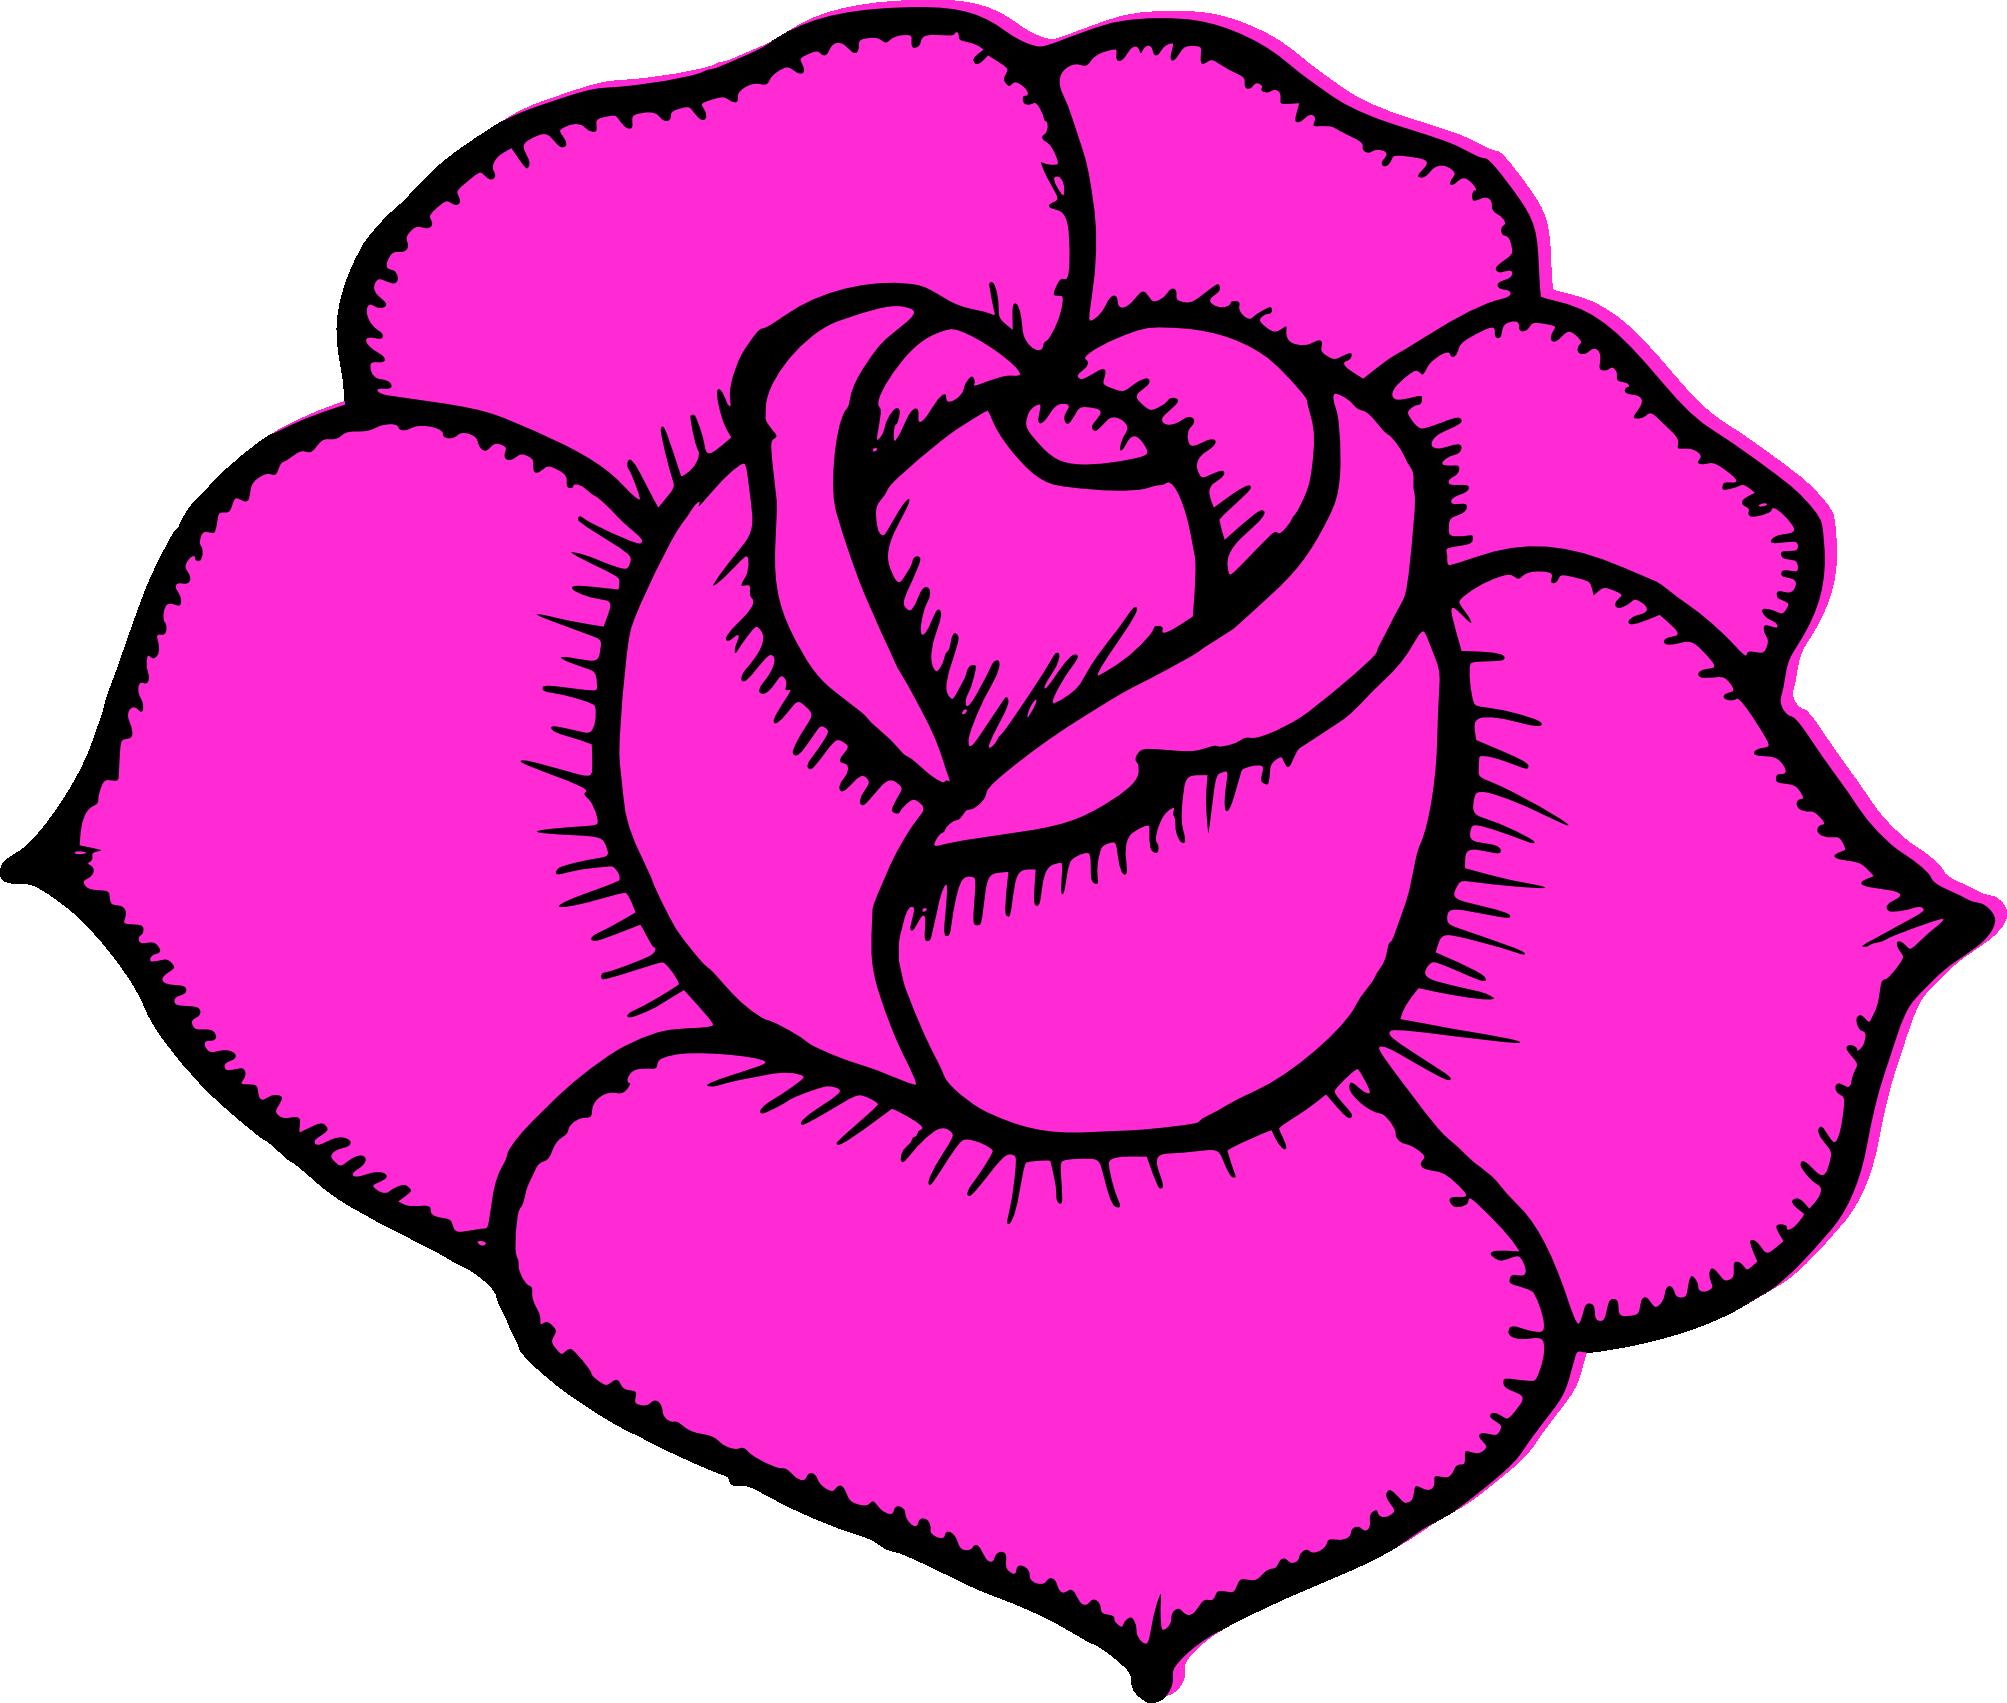 Clipart rose simple. Drawing at getdrawings com